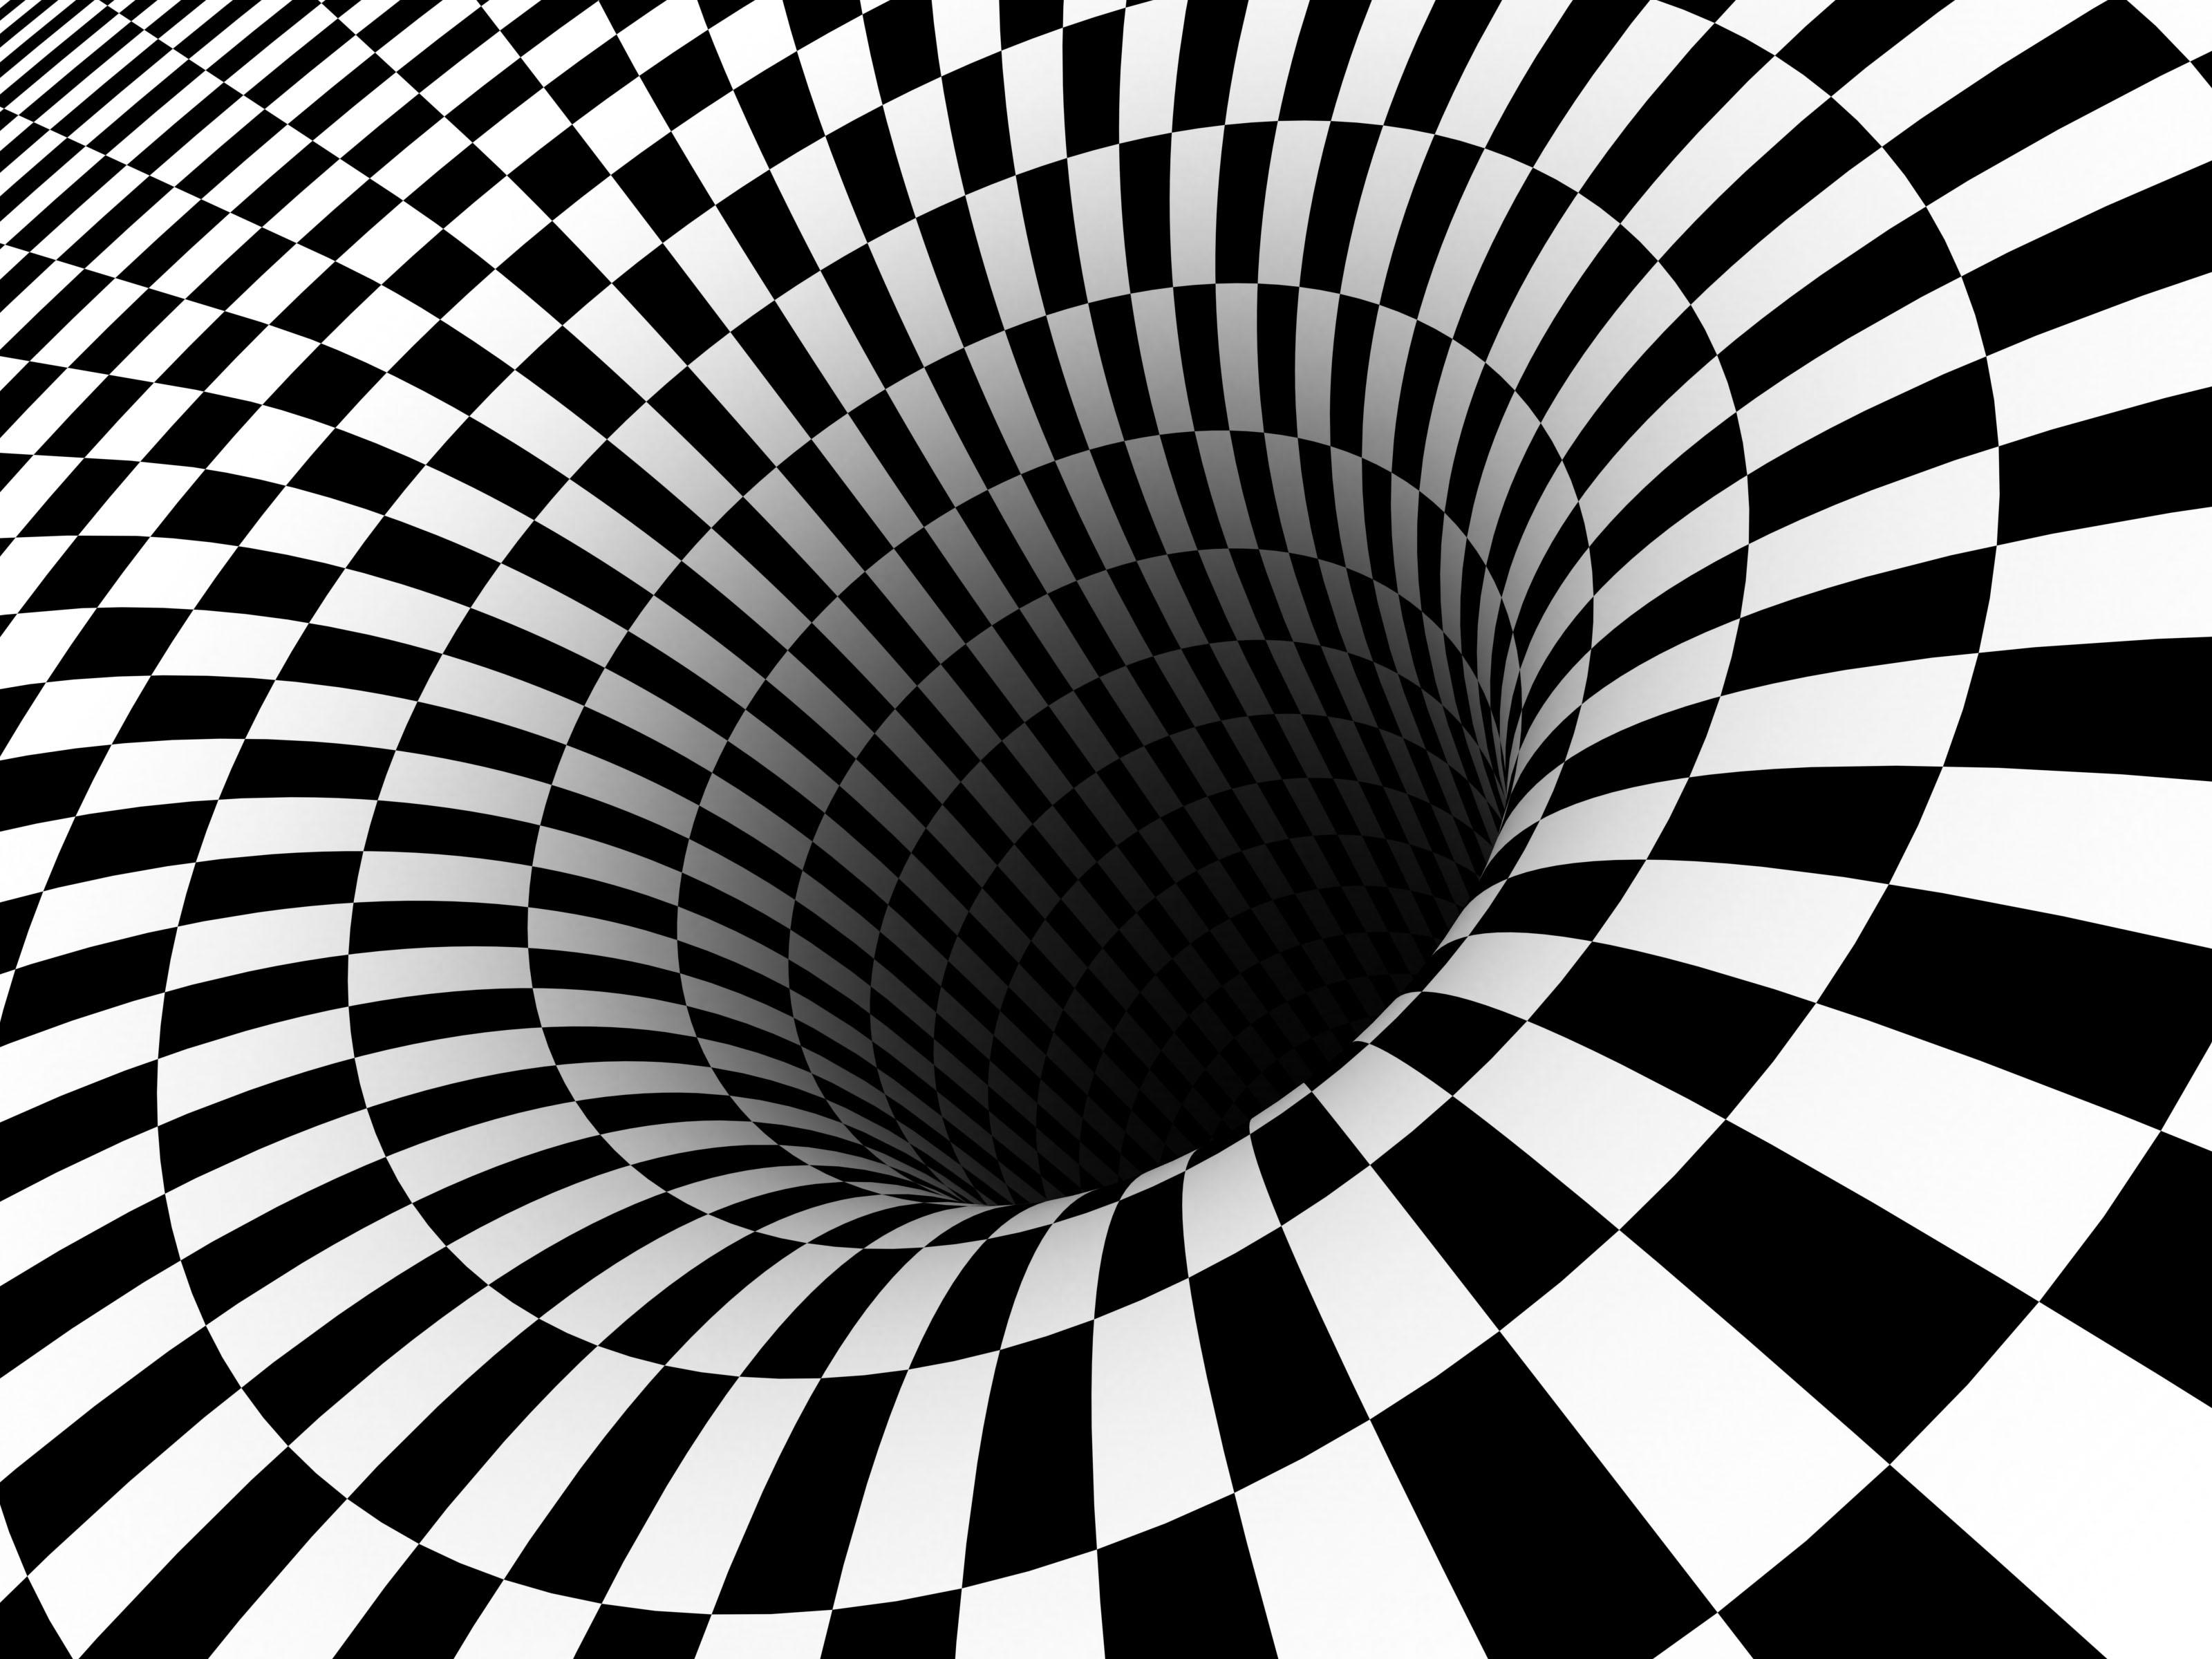 black hole illusion - photo #1